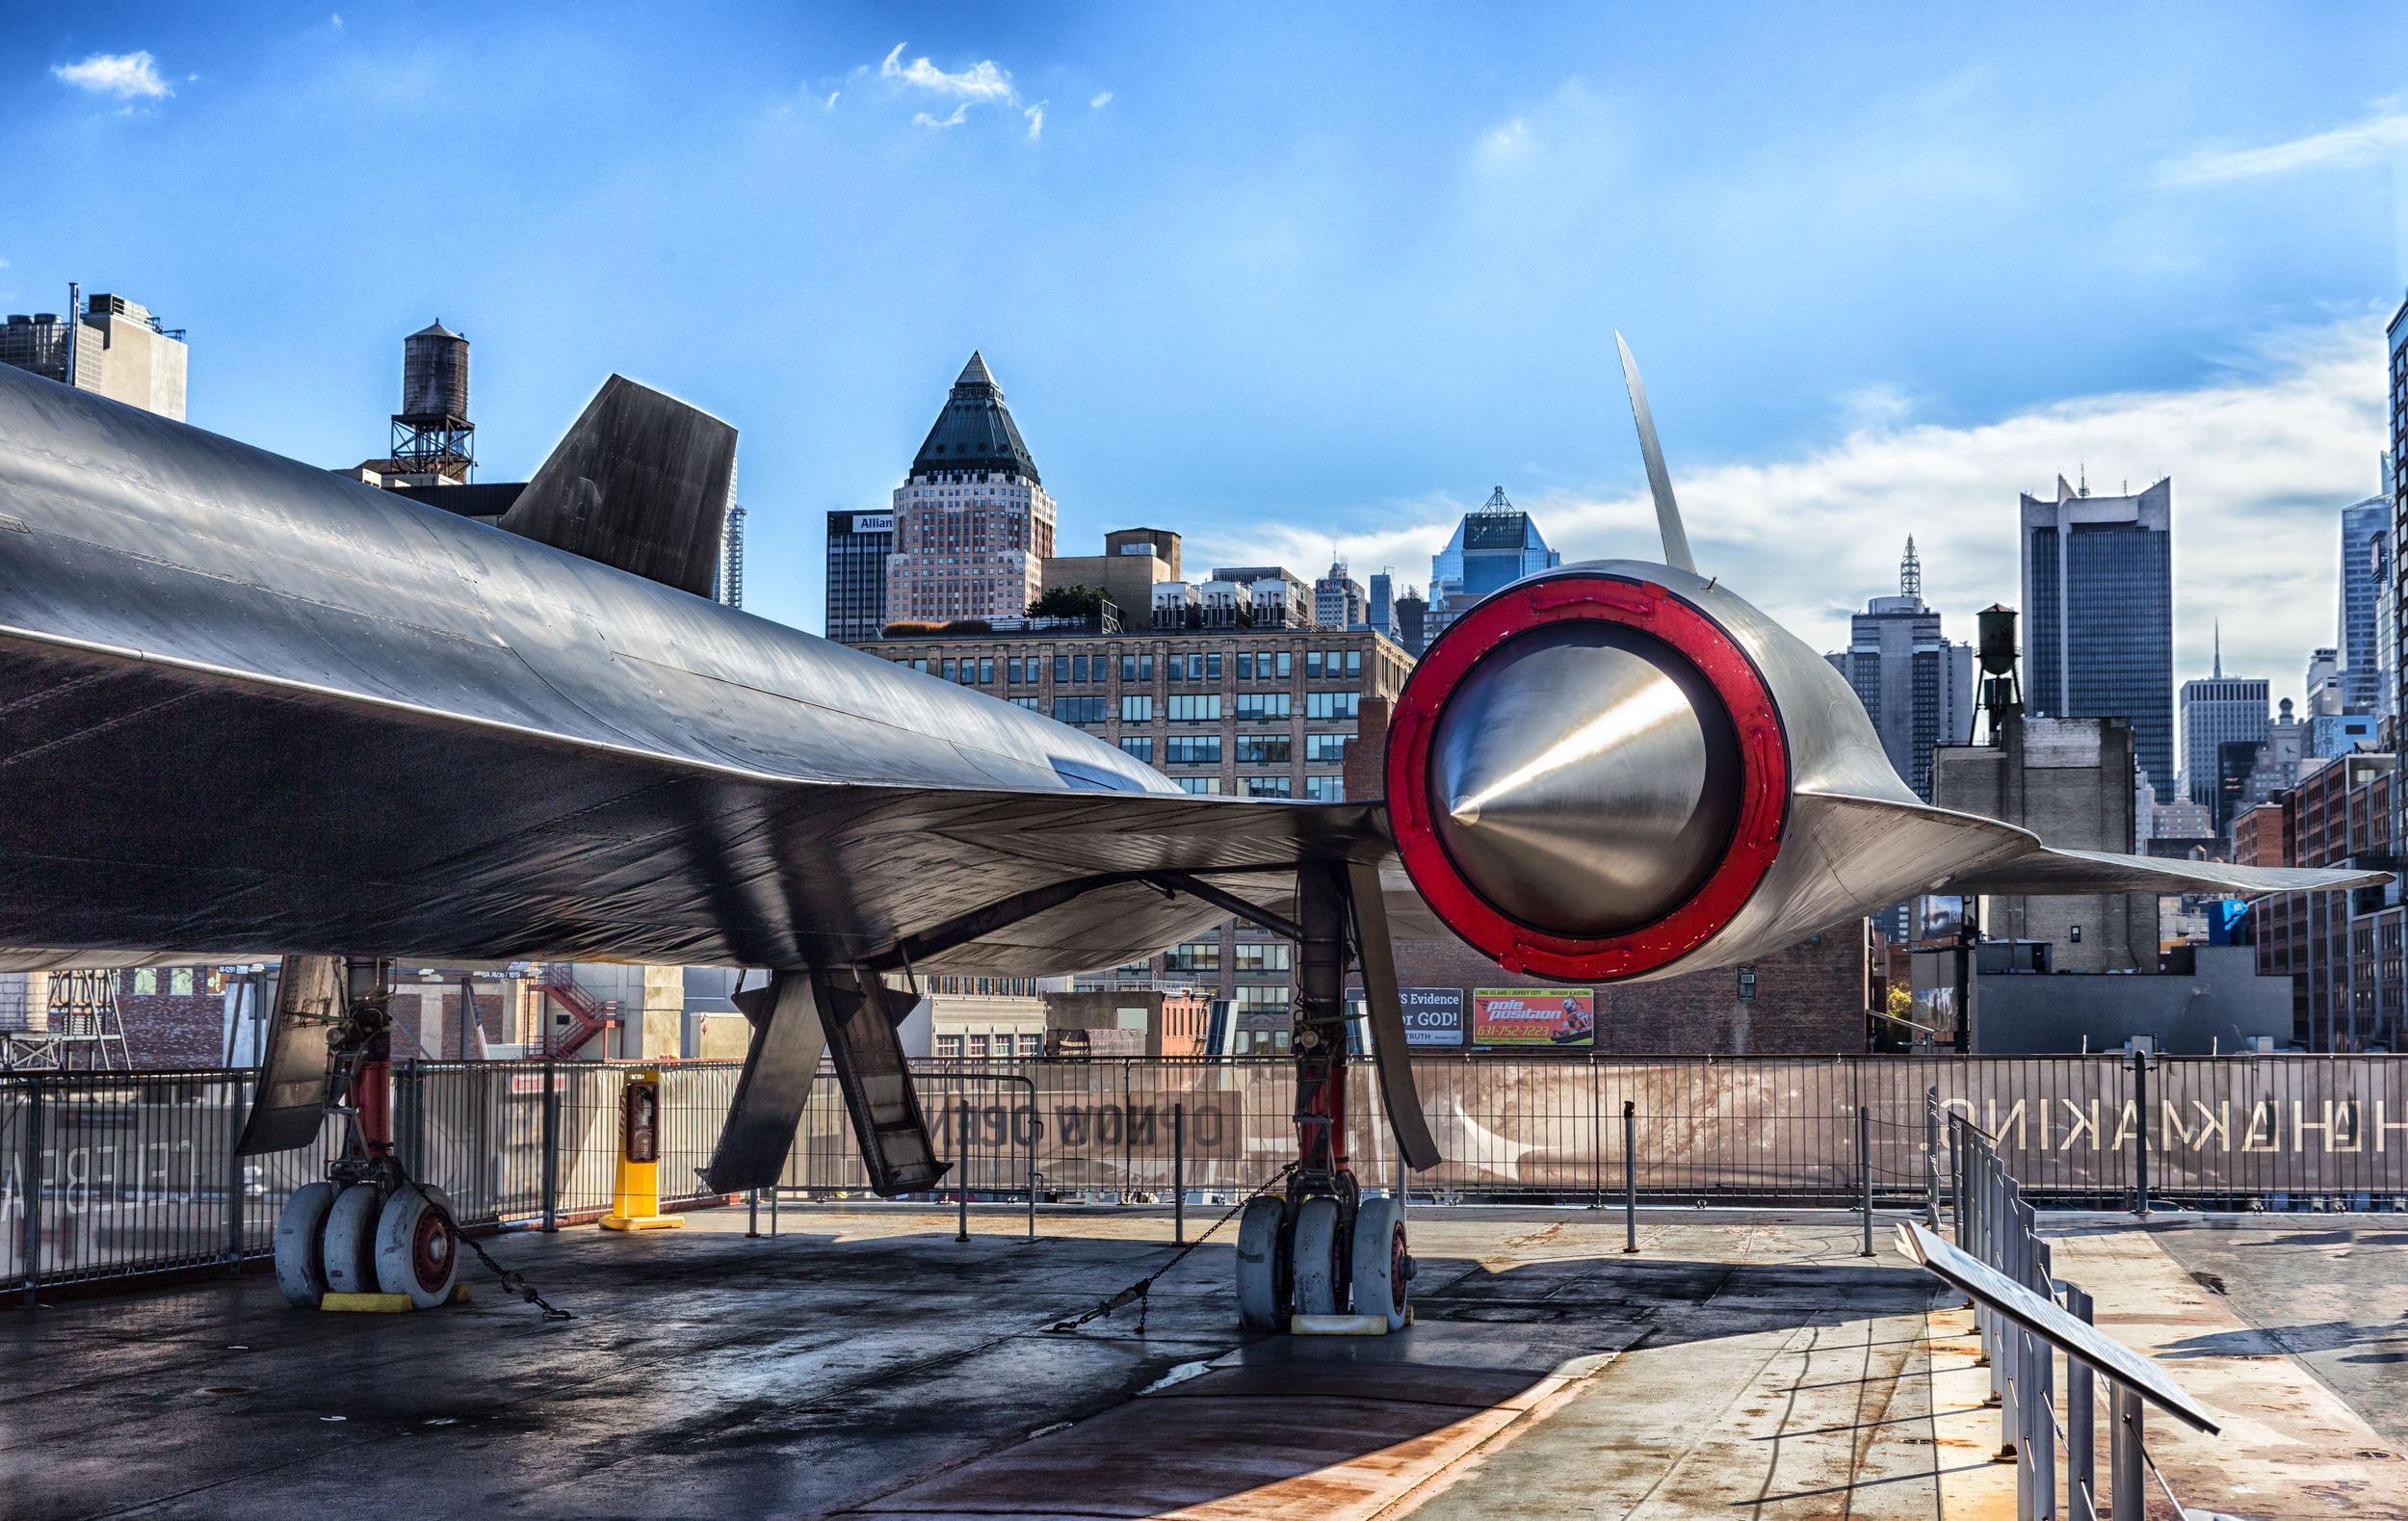 A-12 (CIA version of SR-71 Blackbird) port engine